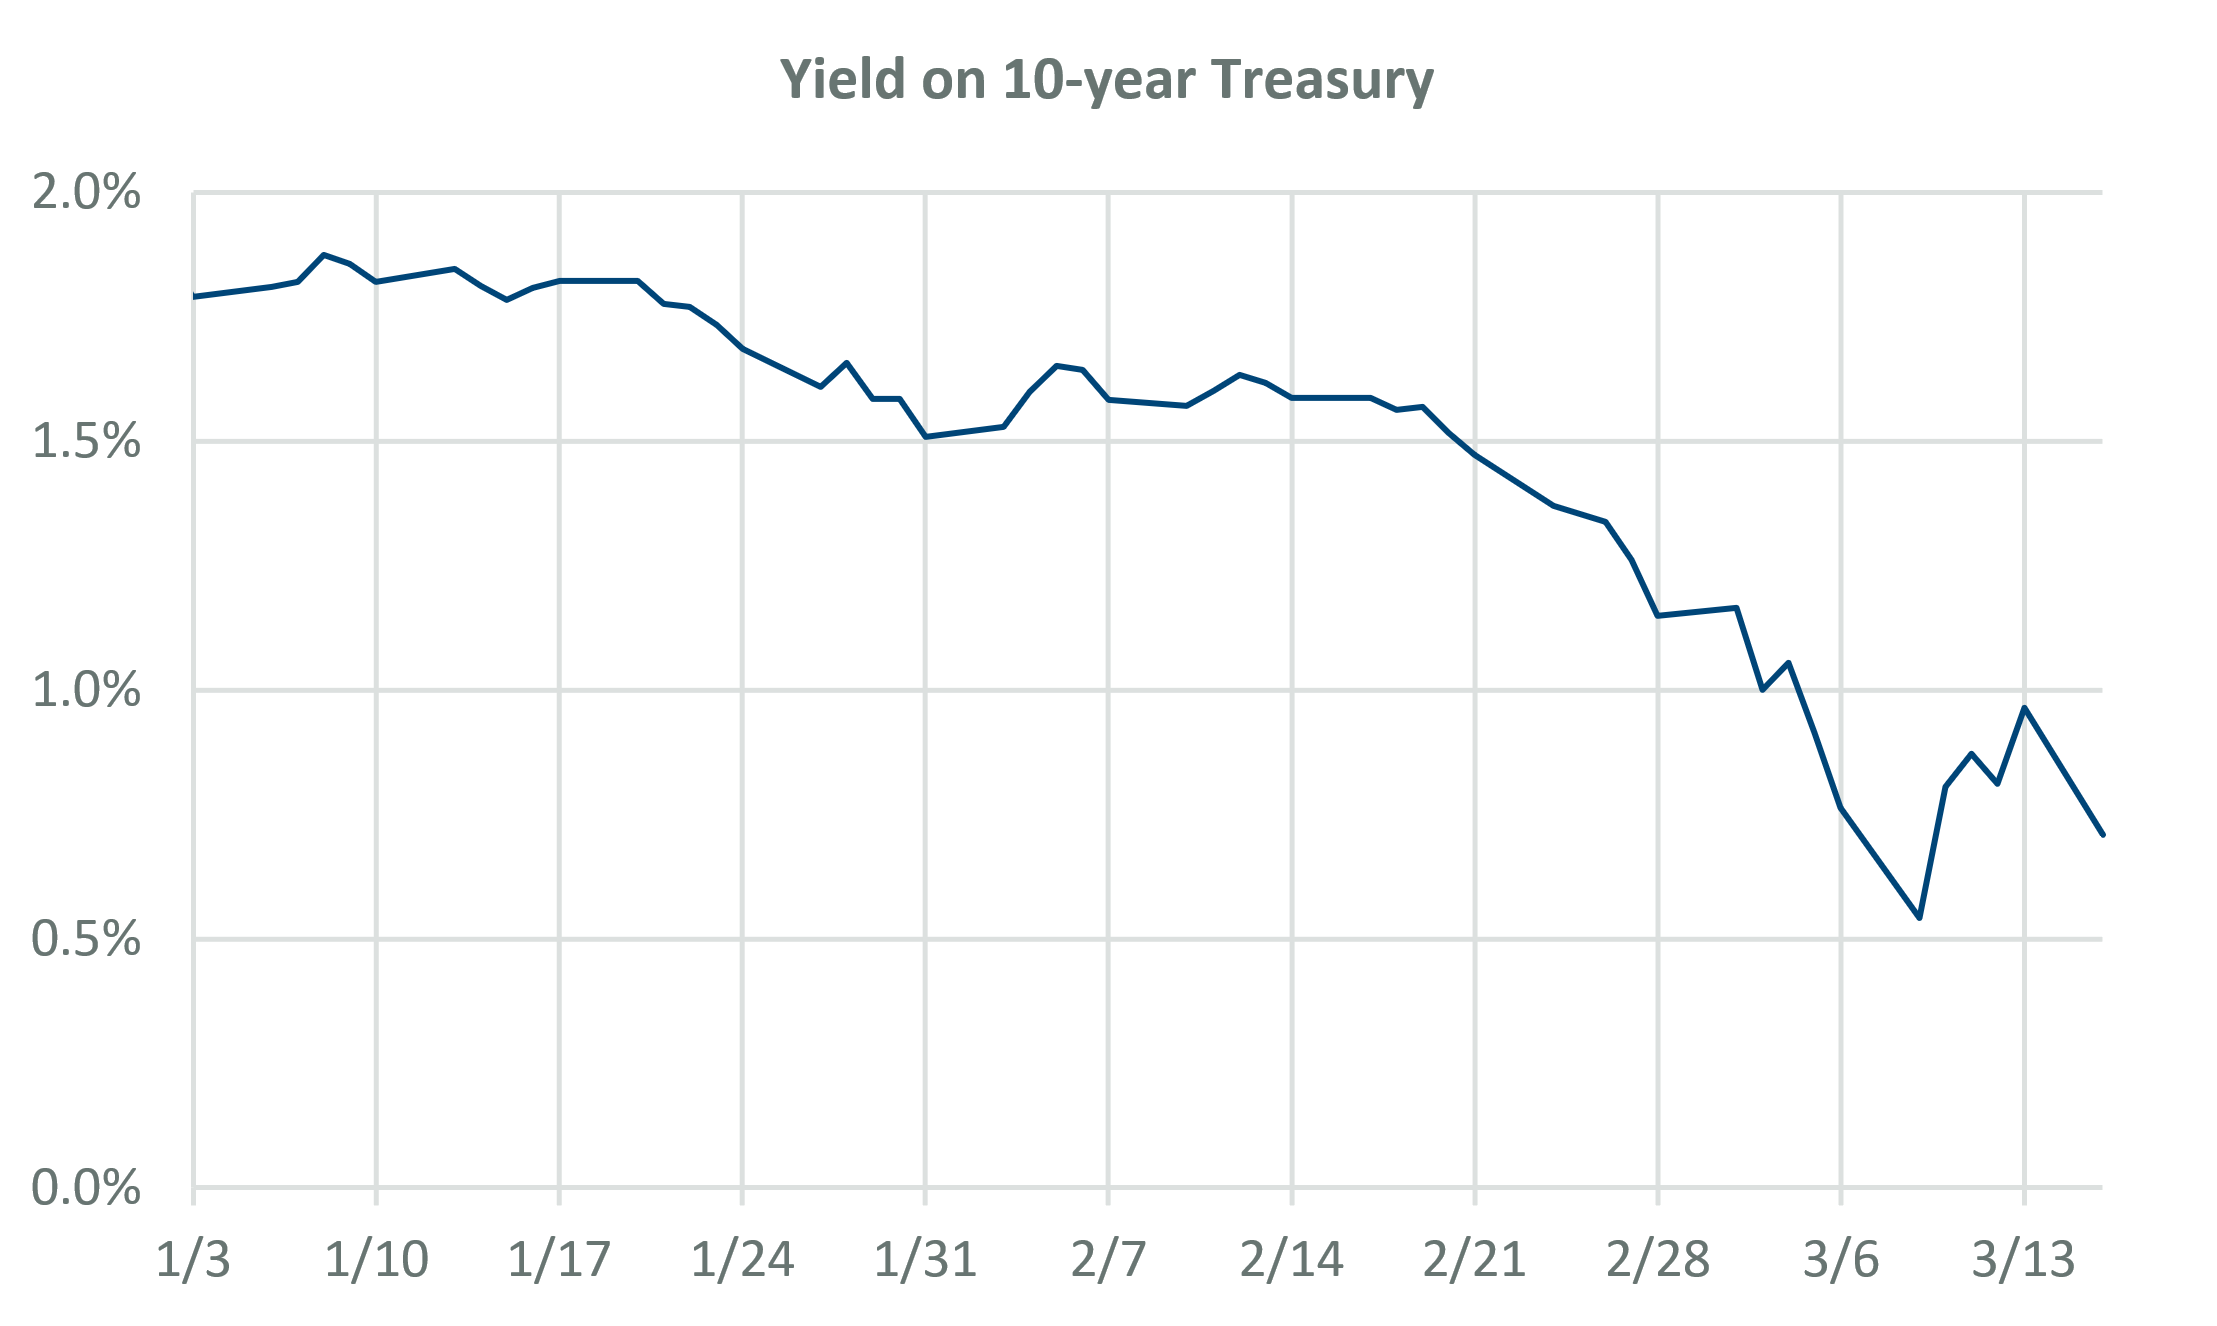 Yield on 10-year Treasury